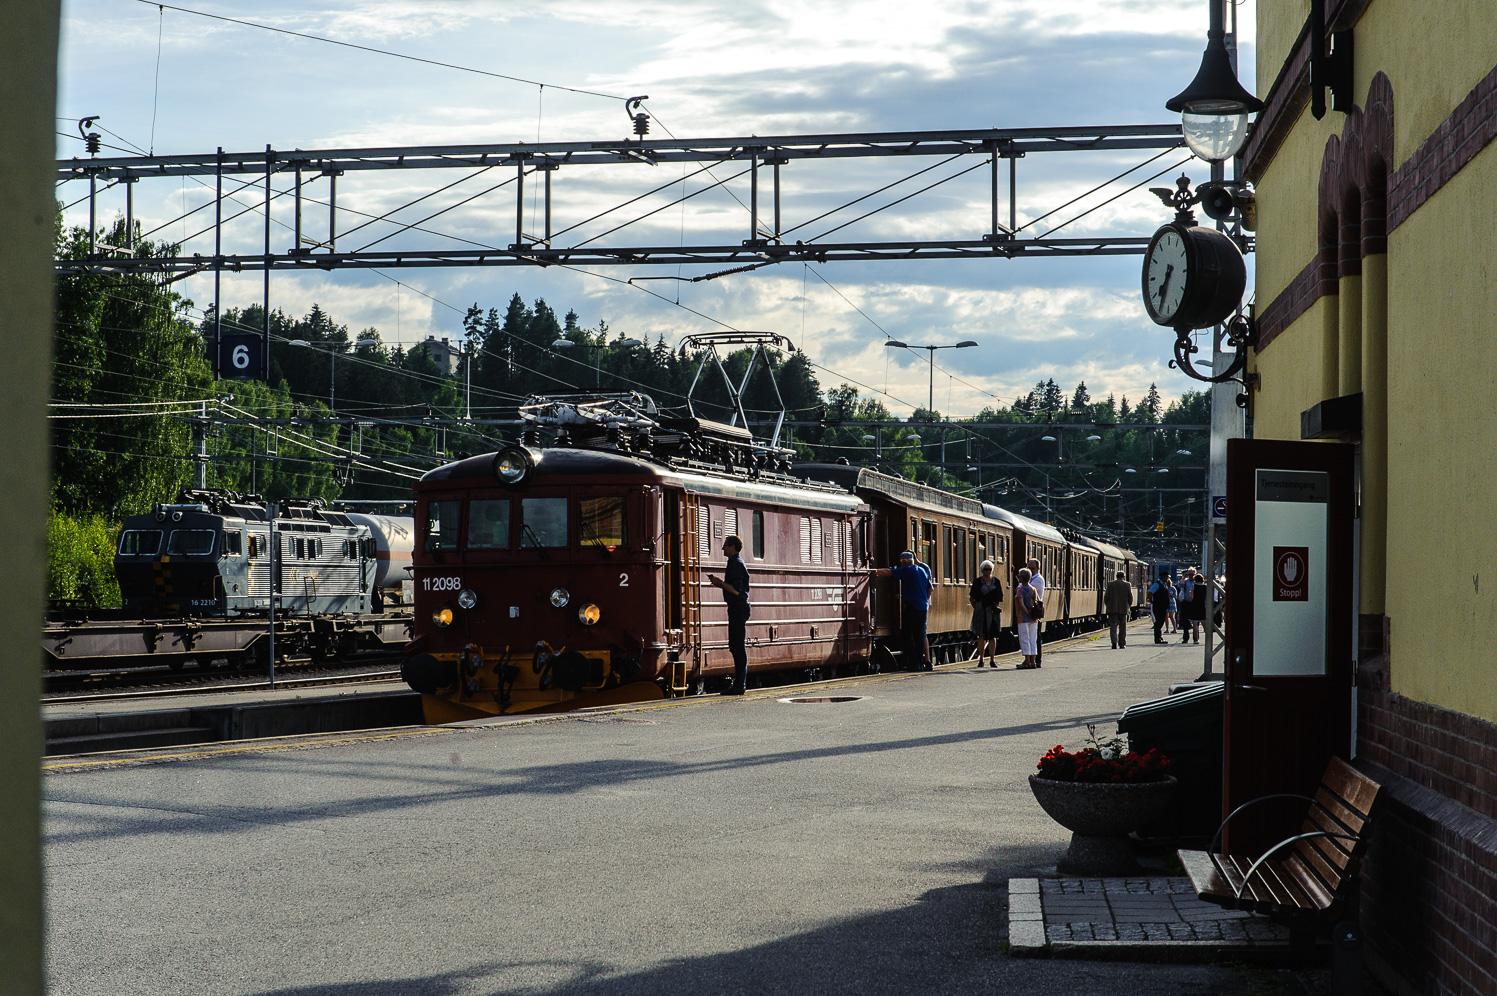 Hønefoss is officially the starting point of Bergensbanen. Here, a museum train makes a halt.